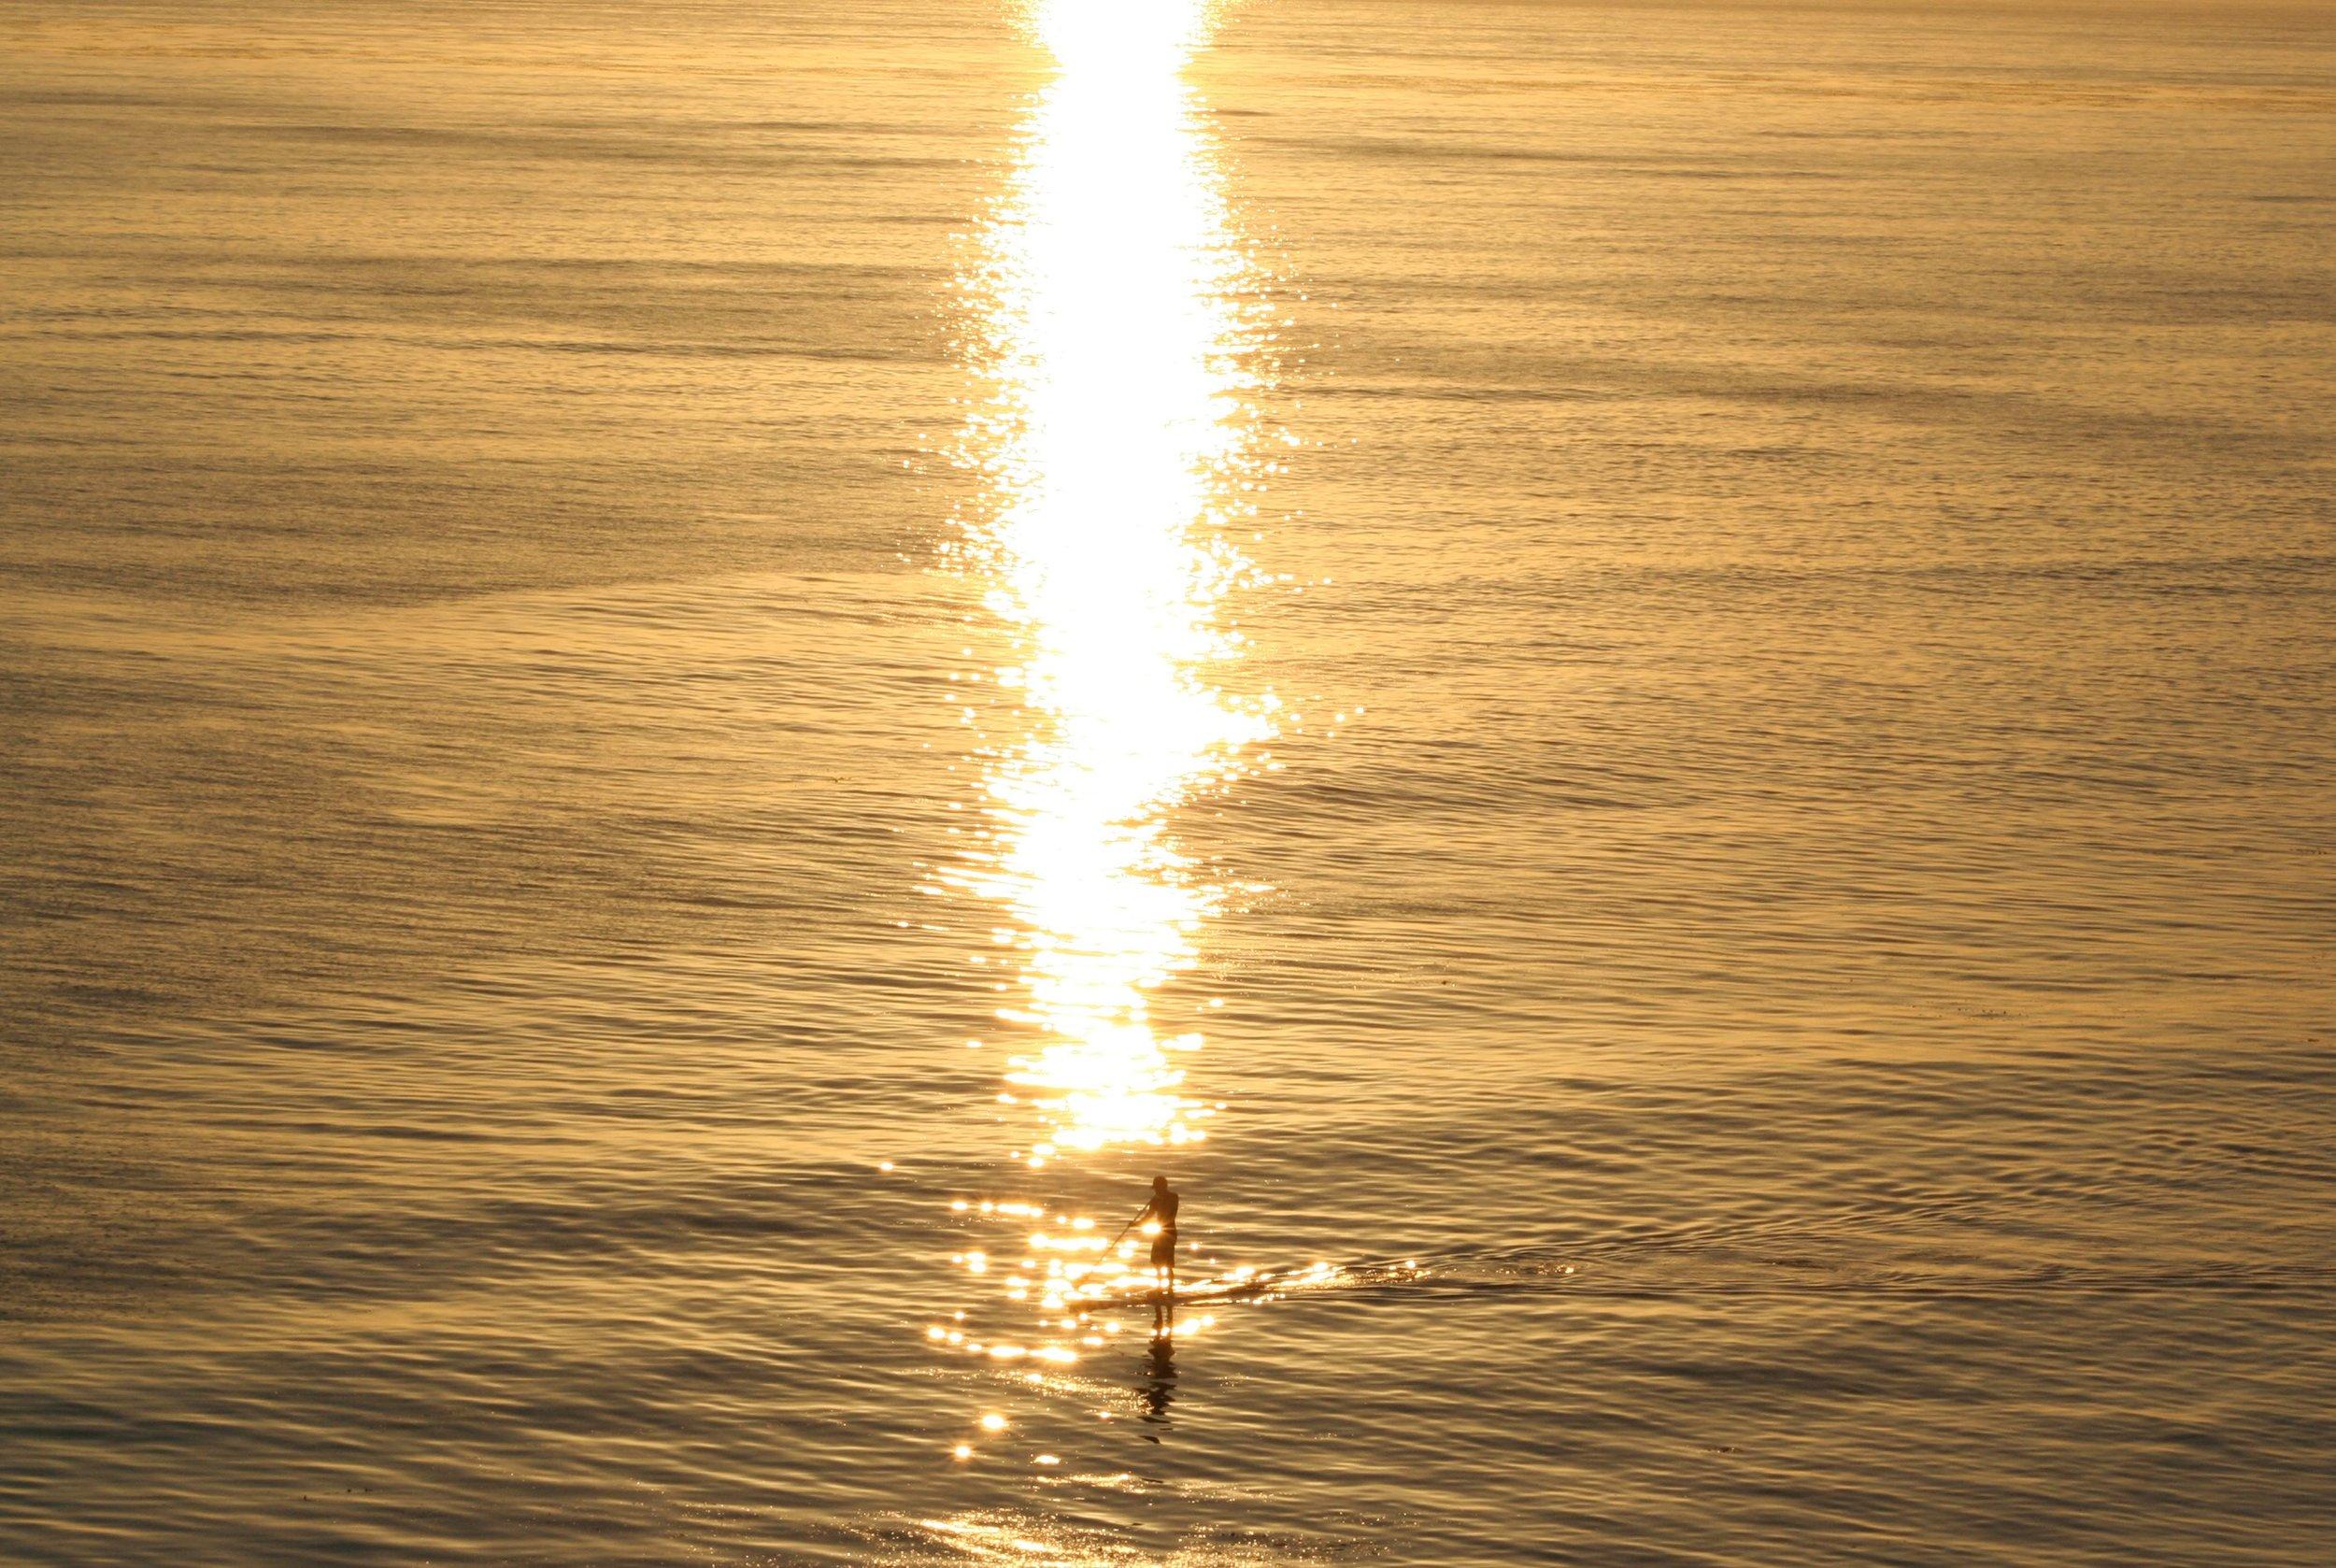 PHOTO | NEVA SULLAWAY